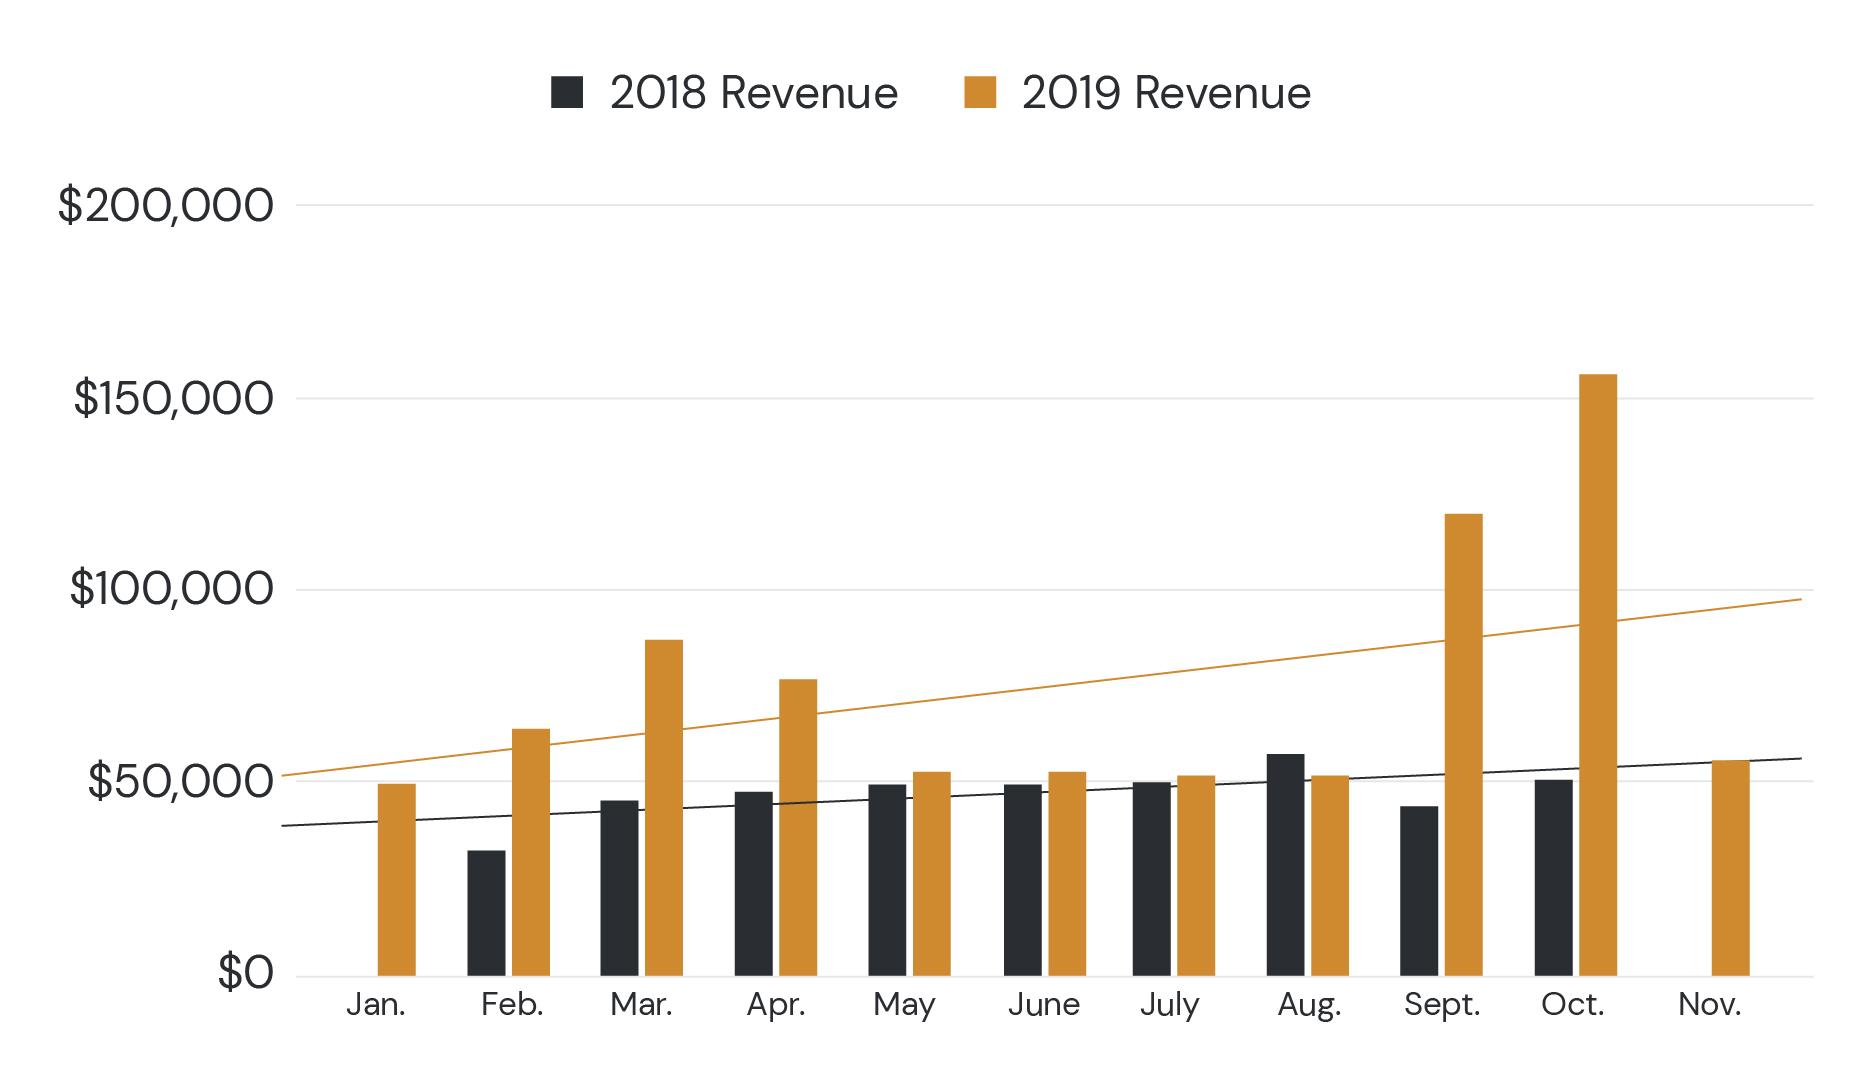 YOY-Revenue